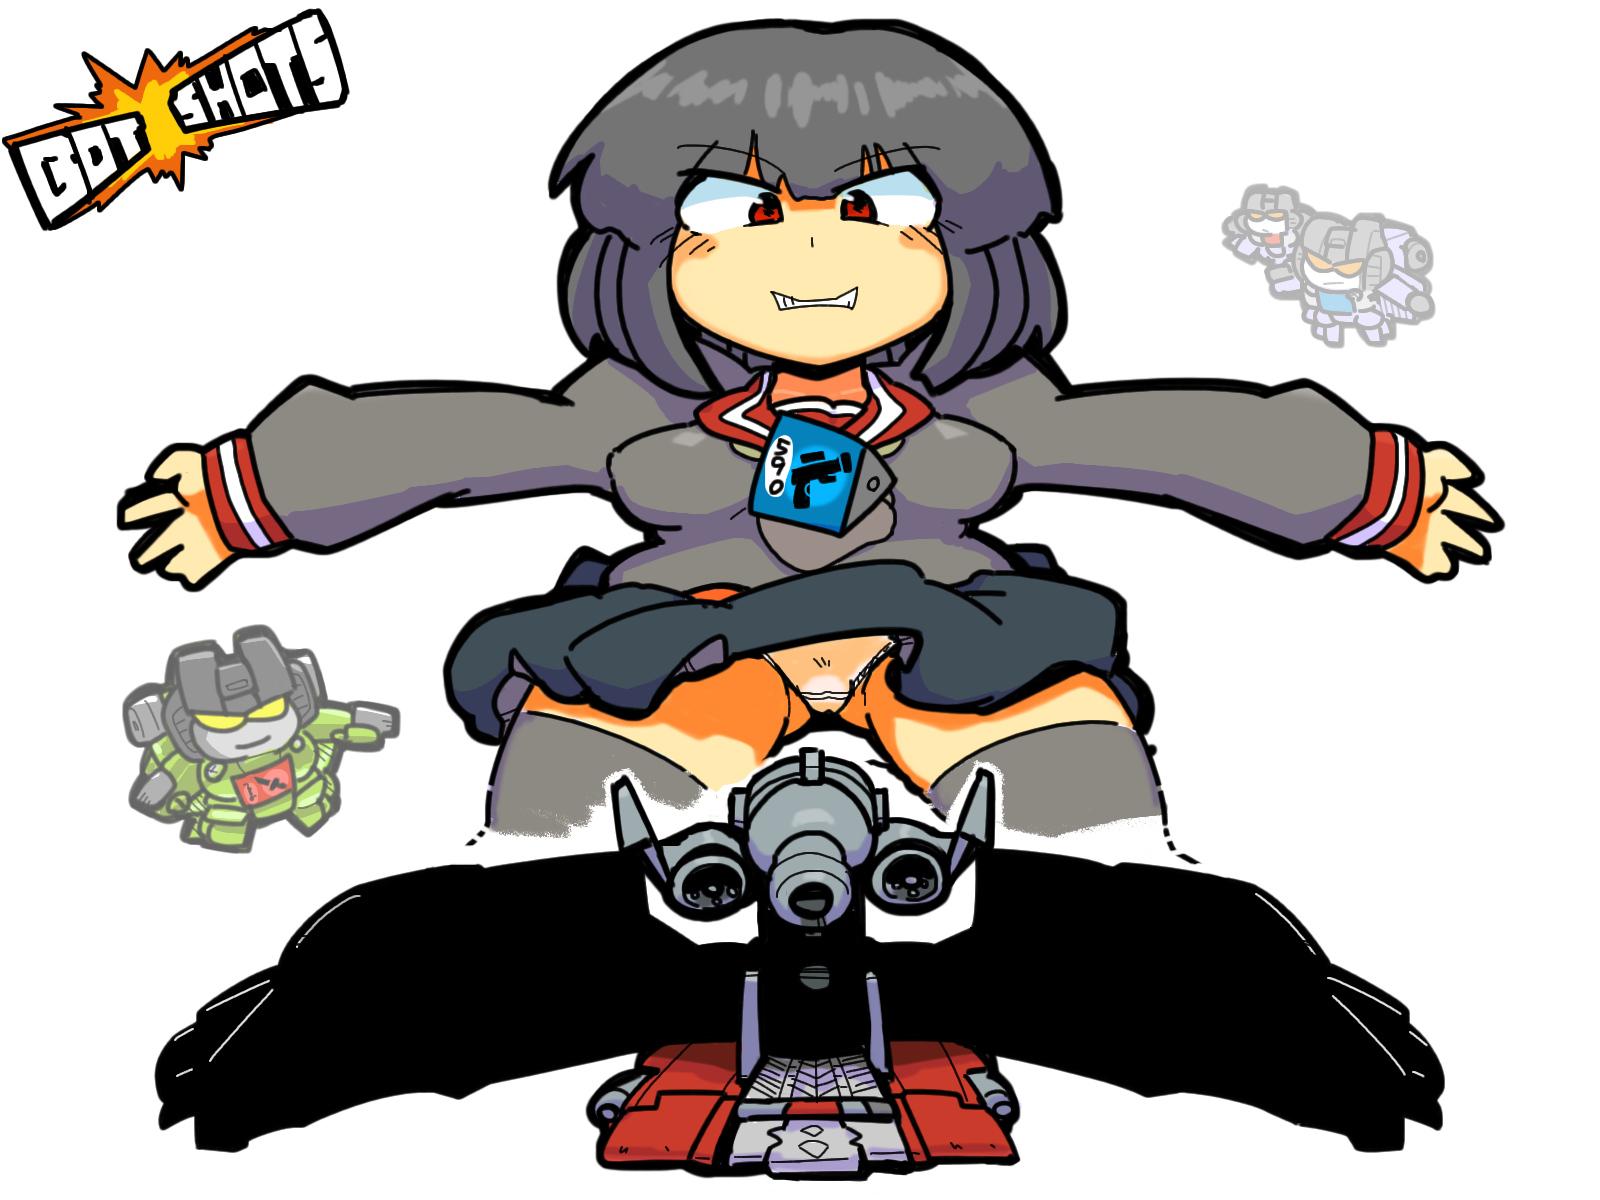 Transformers Generation1 Bot Shots Starscream Seeker Launcher Pretenders Humanized Gijinka Robot girl Holomatter Avatars